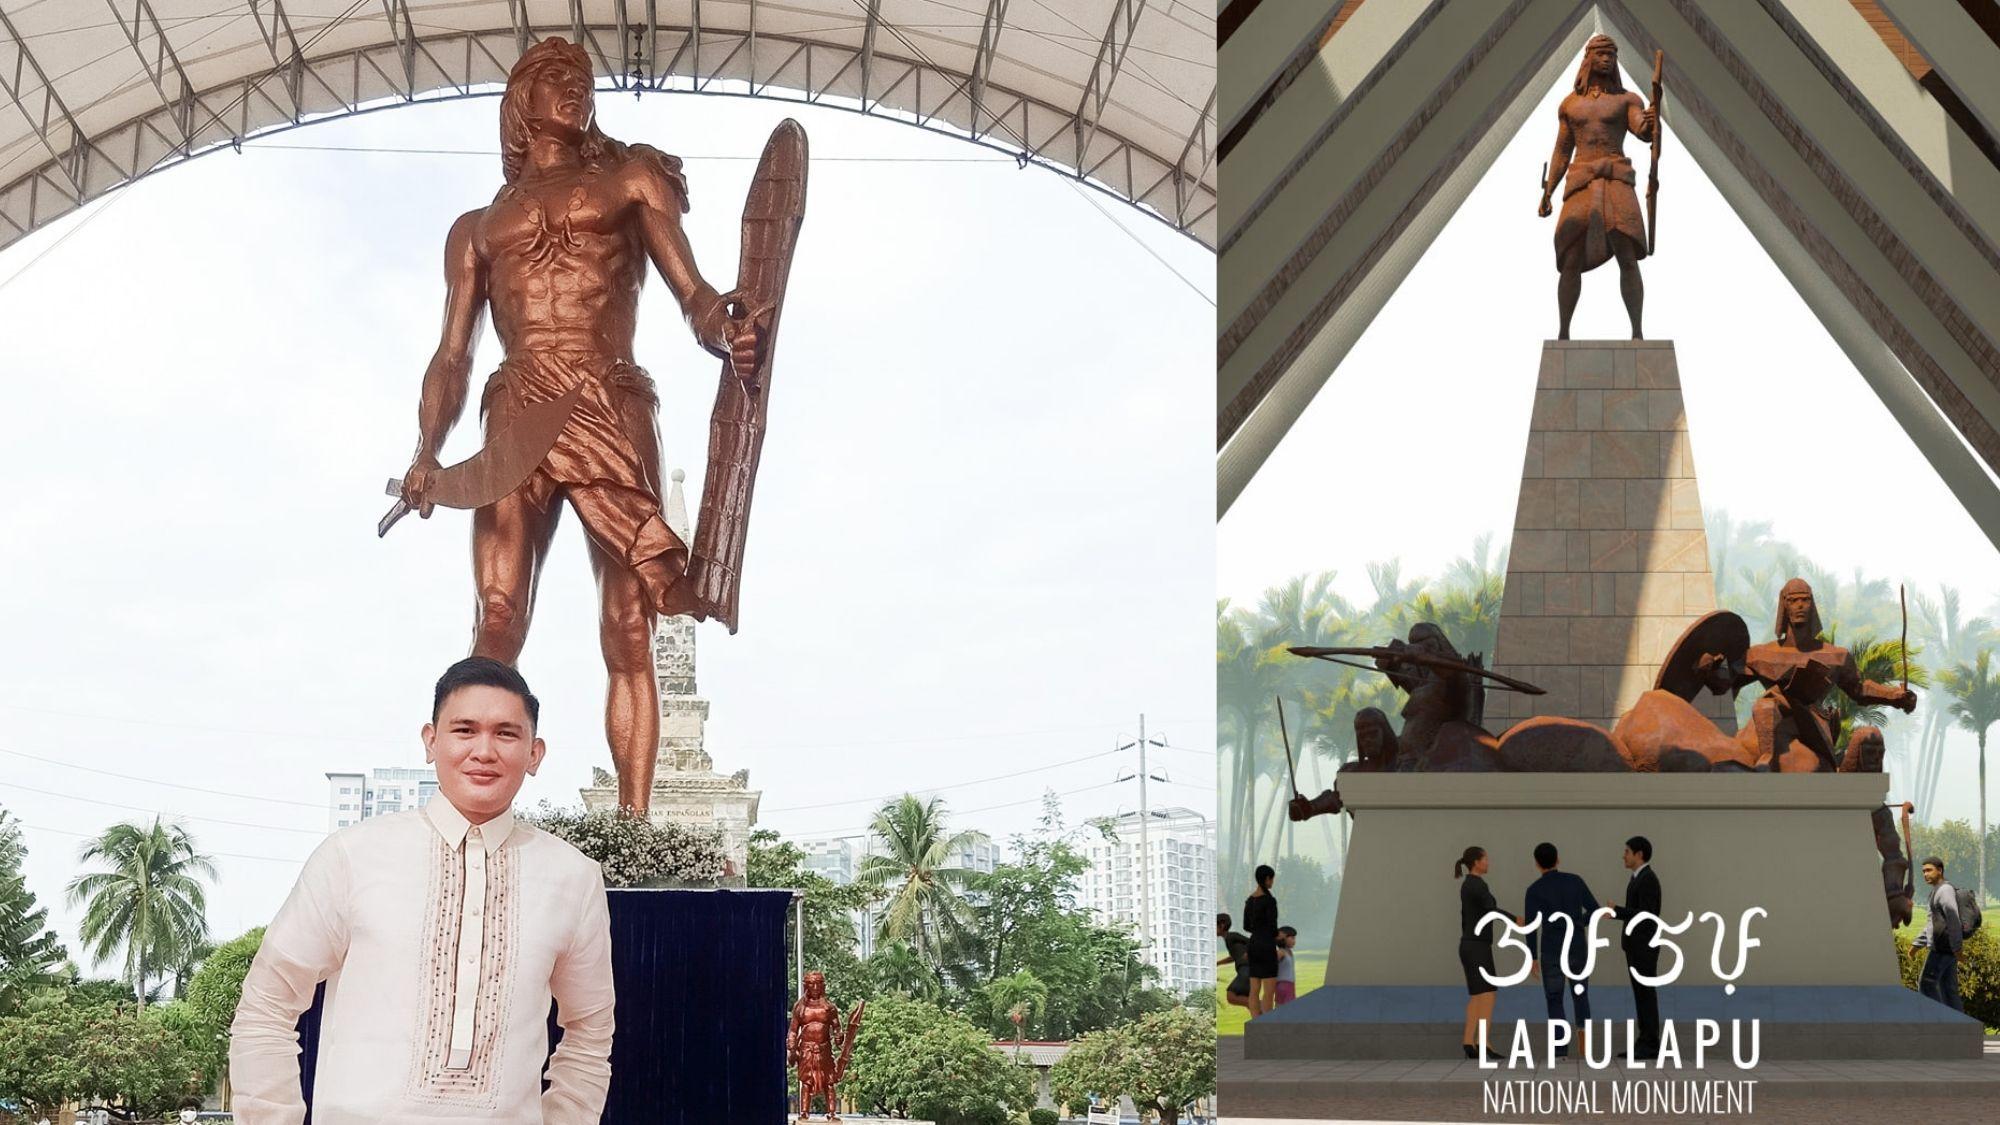 New Lapu-Lapu monument pays tribute to the hero's bravery and leadership